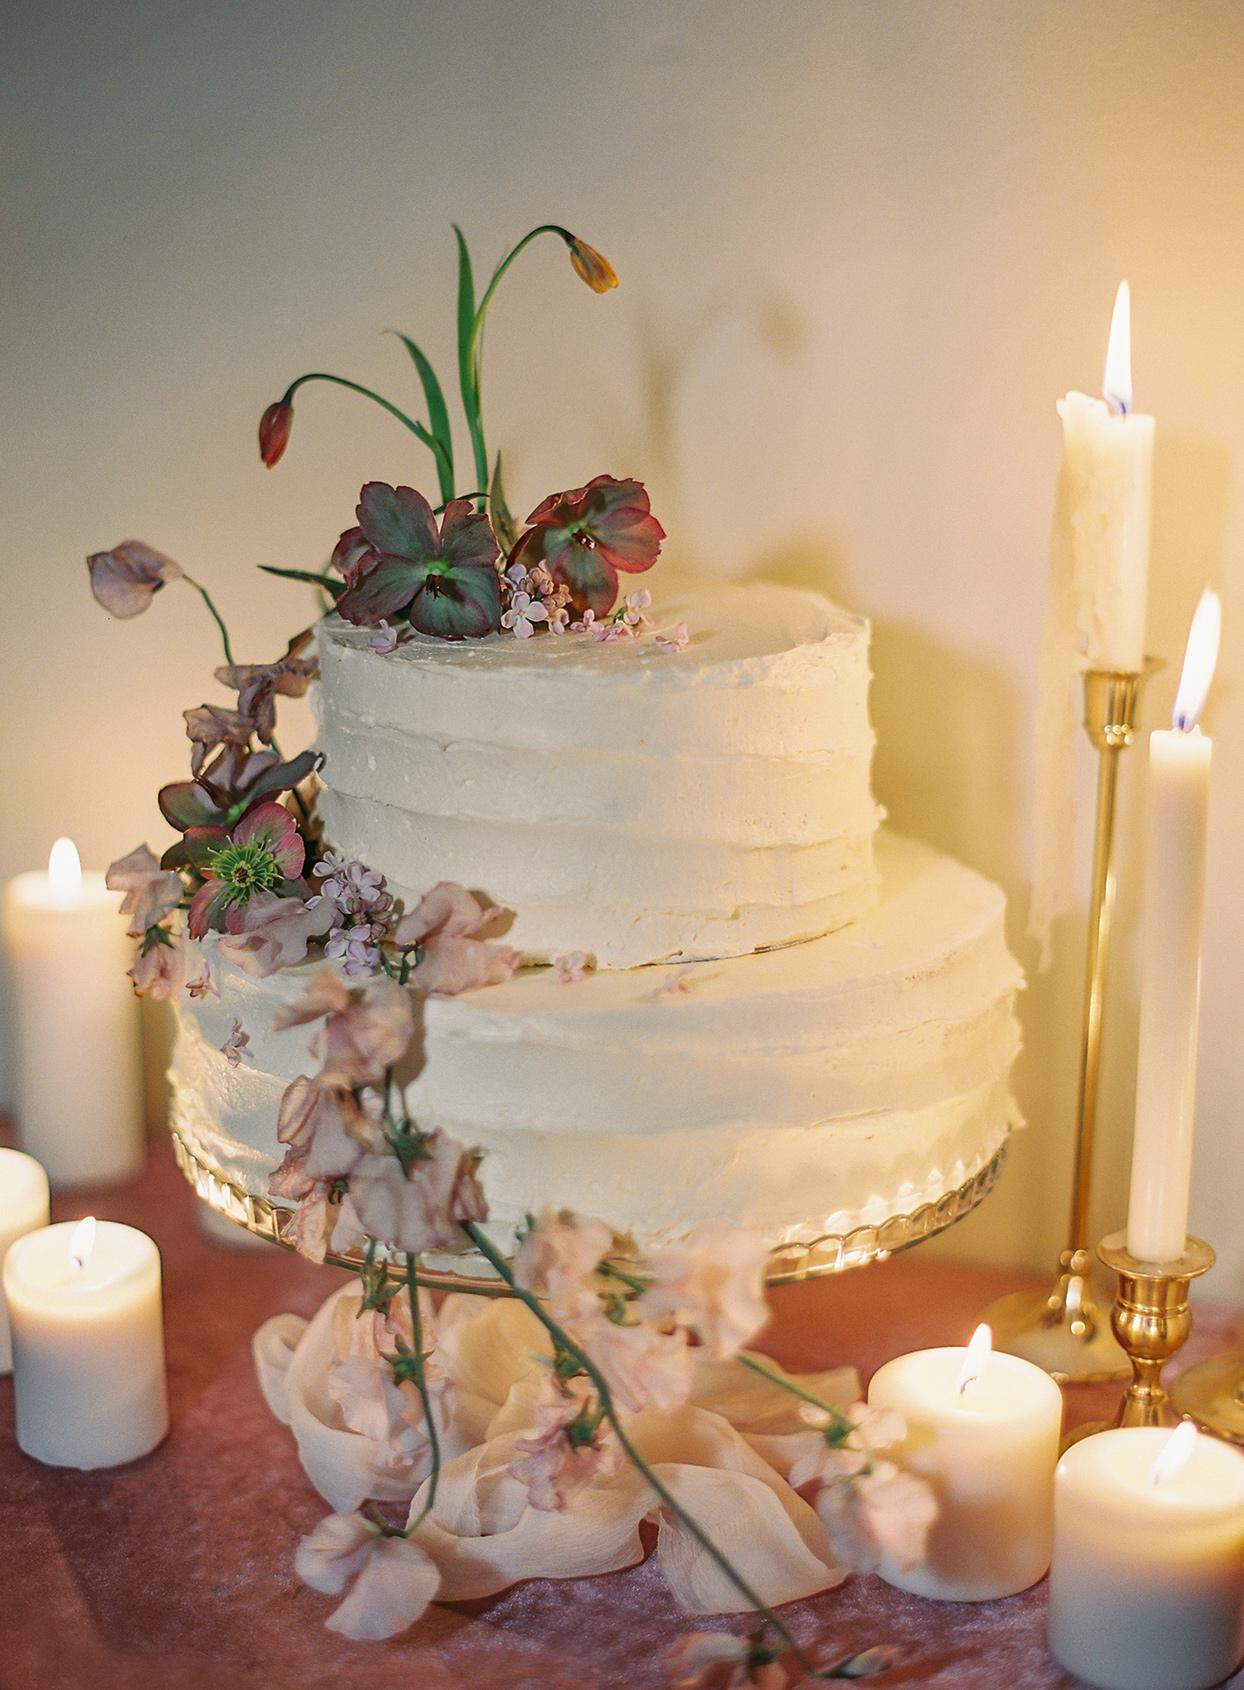 jen alan wedding cake by candlelight